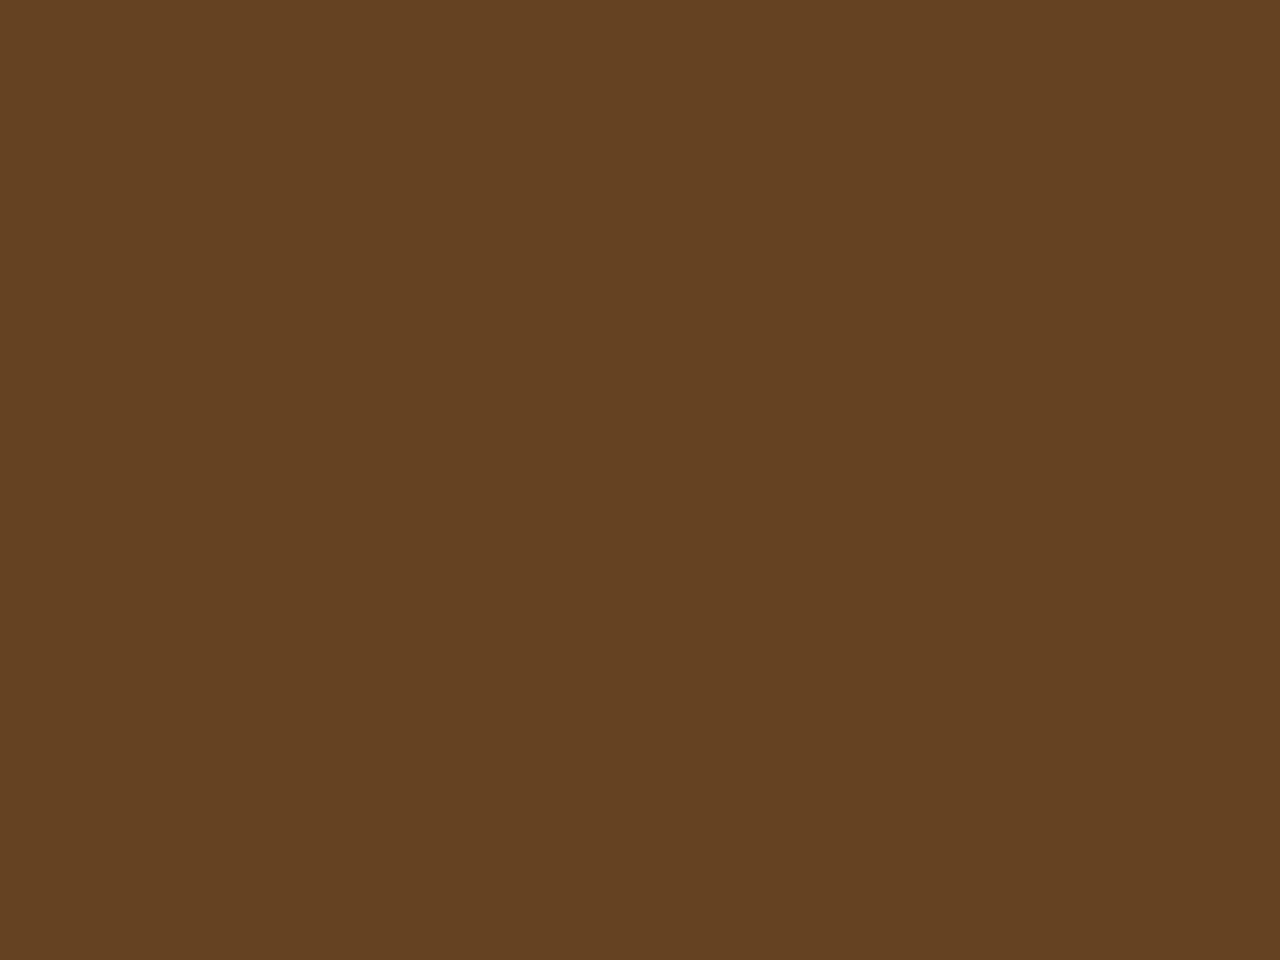 1280x960 Dark Brown Solid Color Background